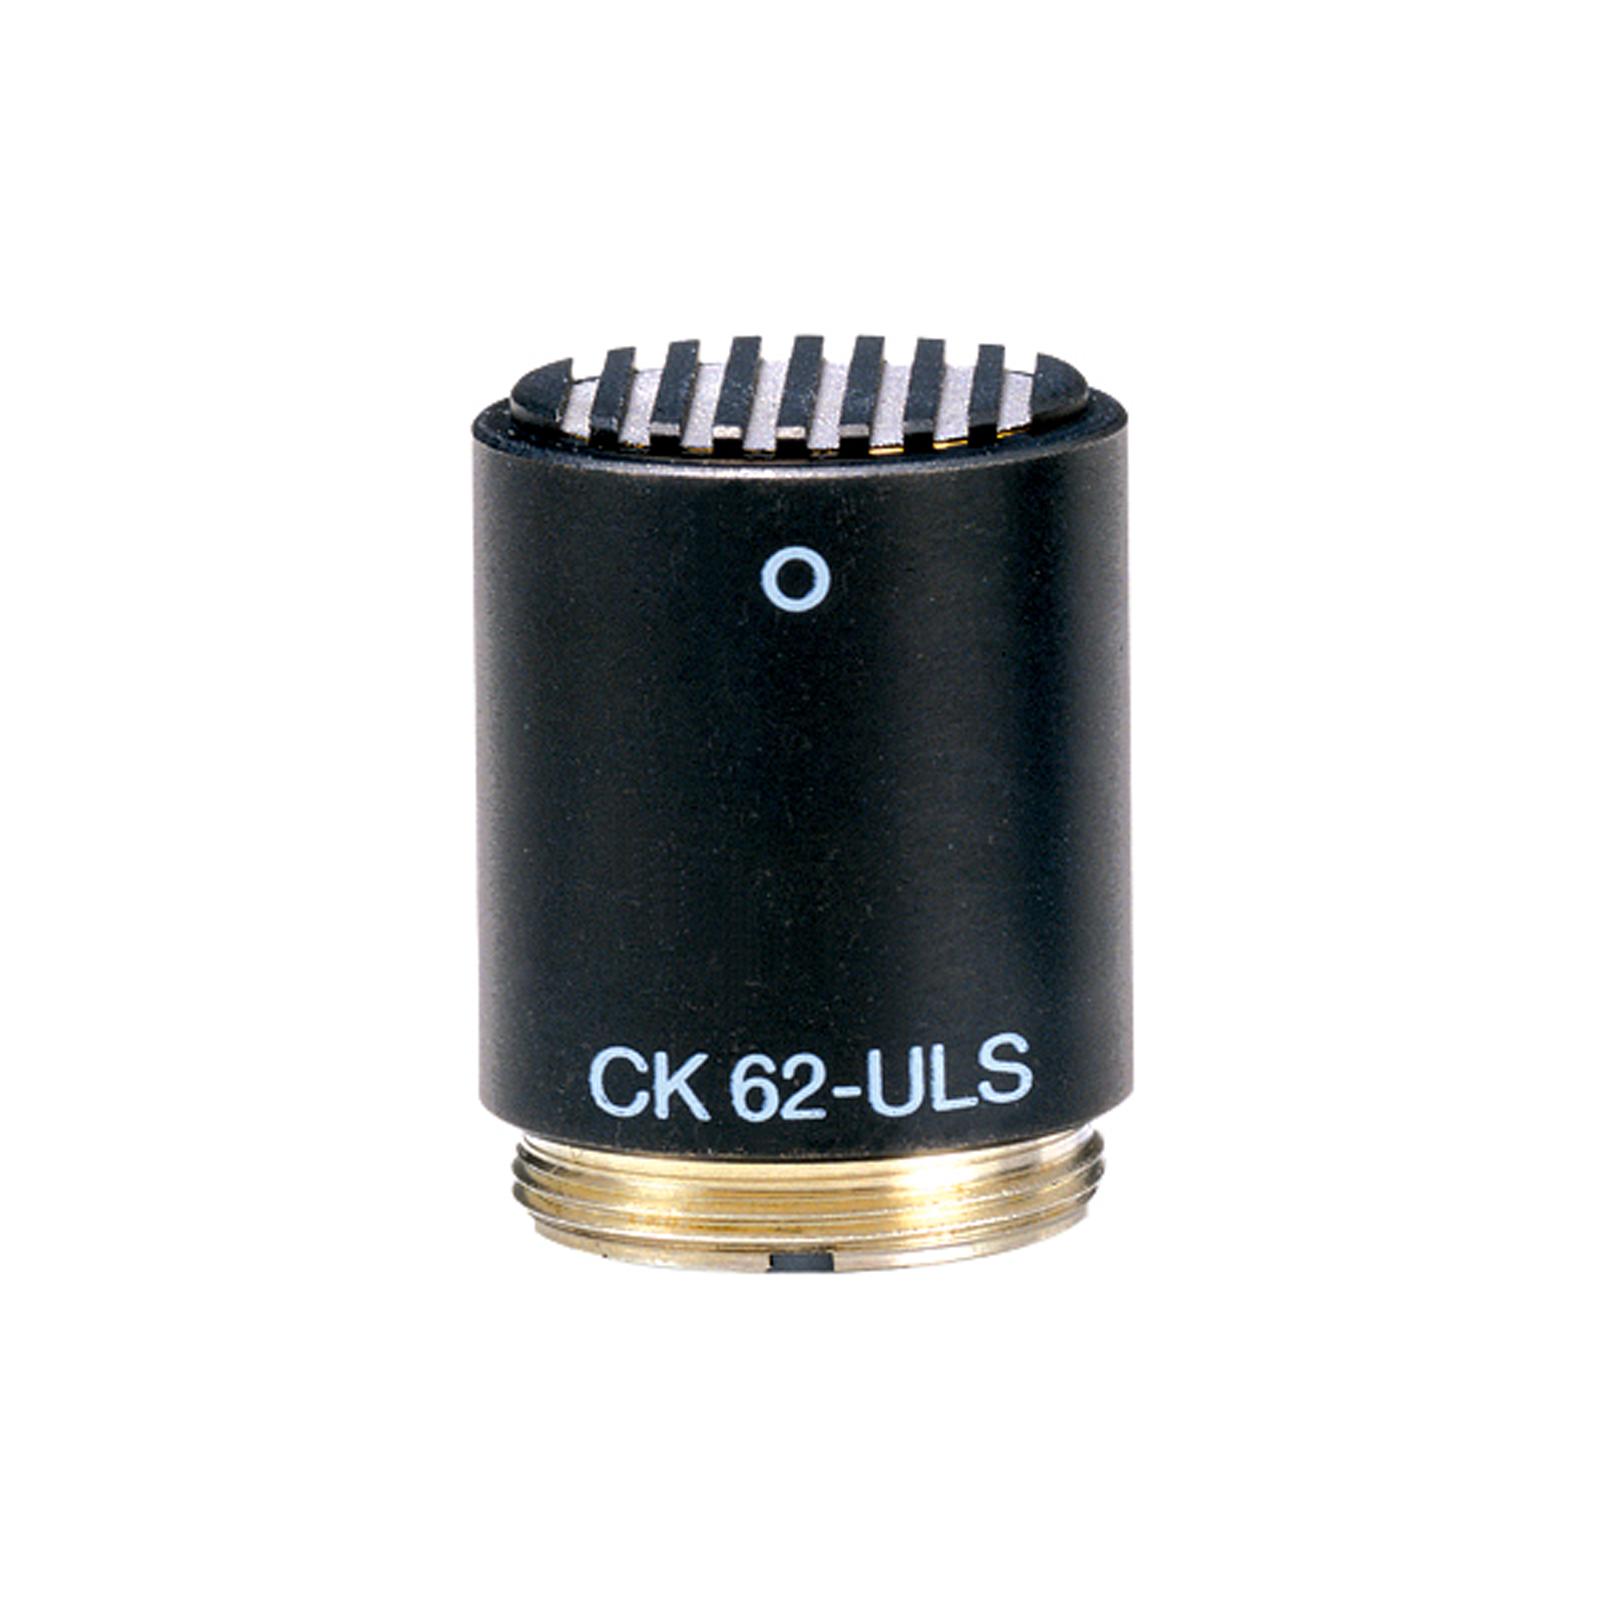 CK62 ULS